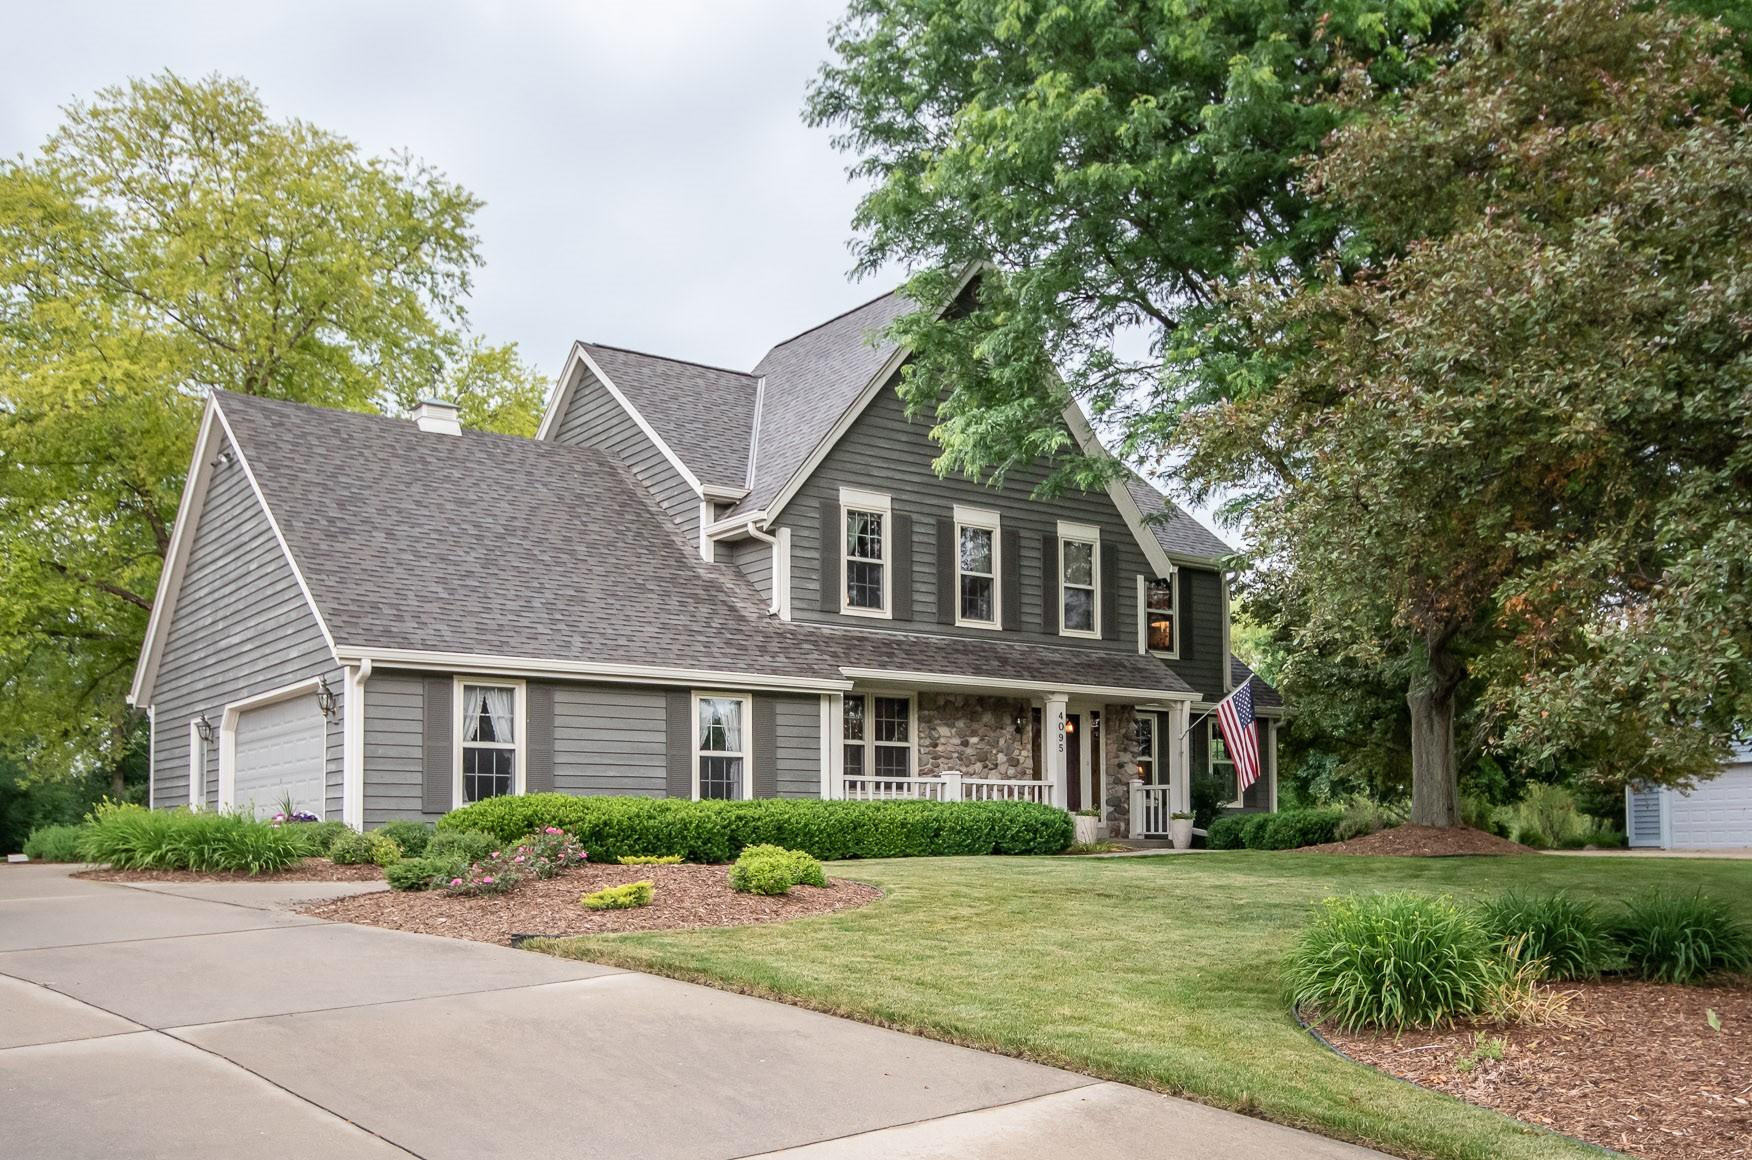 4095 Clare Bridge Ln, Brookfield, Wisconsin 53005, 3 Bedrooms Bedrooms, 8 Rooms Rooms,2 BathroomsBathrooms,Single-Family,For Sale,Clare Bridge Ln,1695225